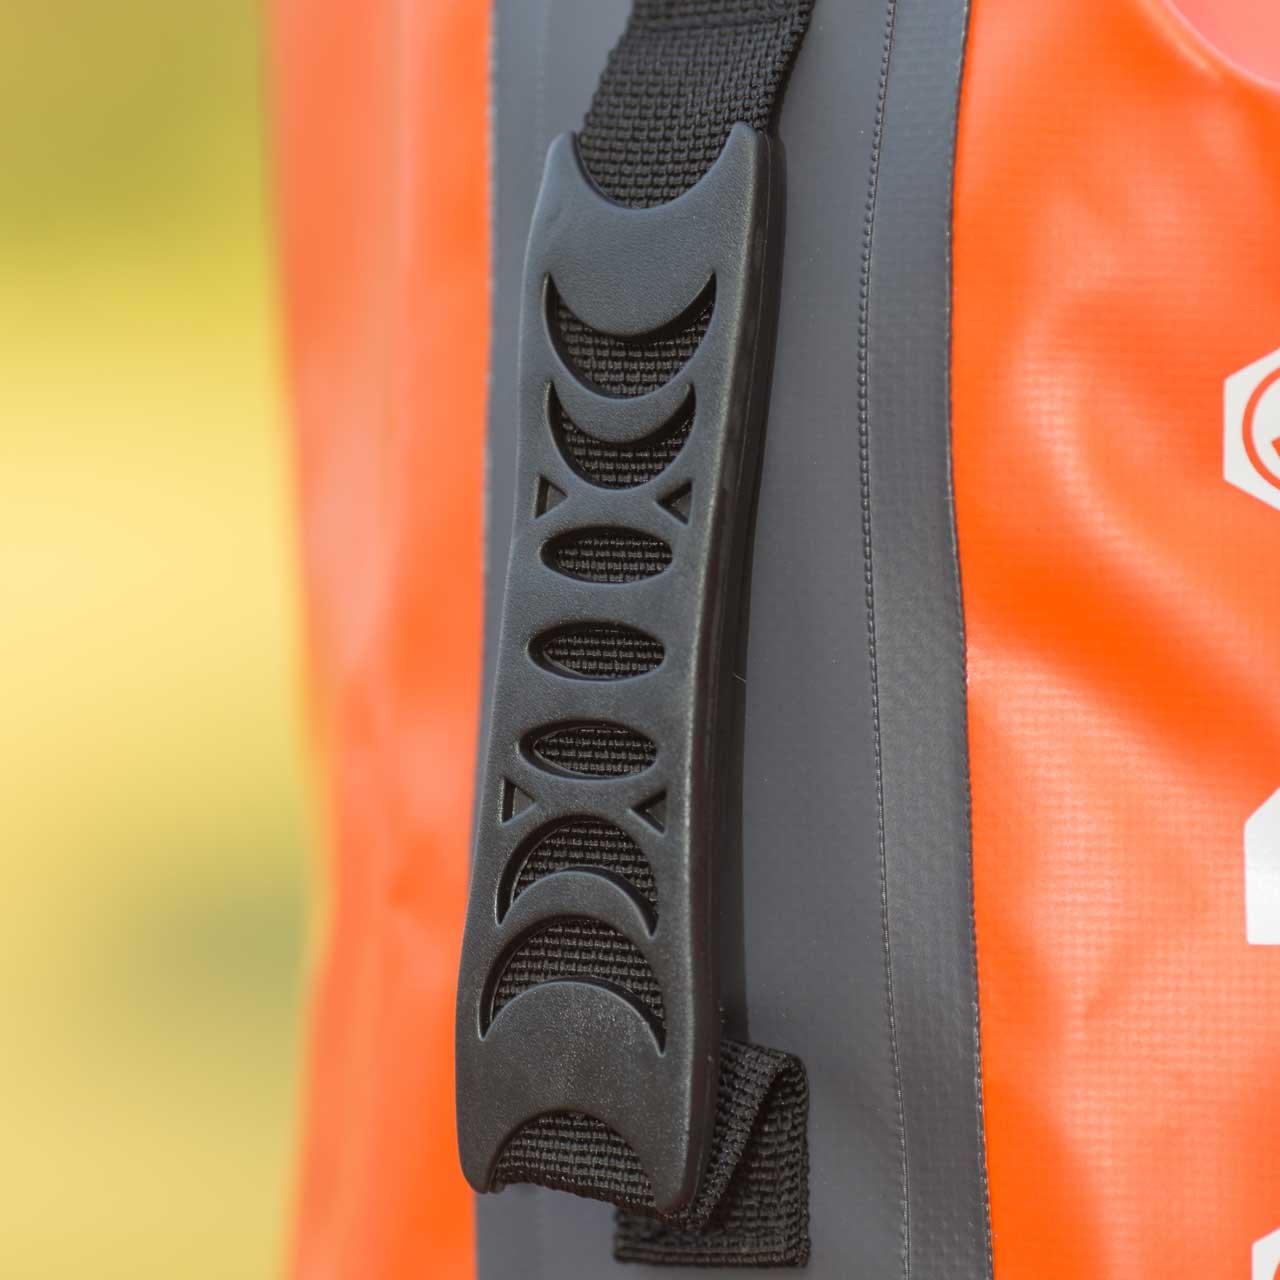 Close up of the orange Tuff Tote Bag's handle